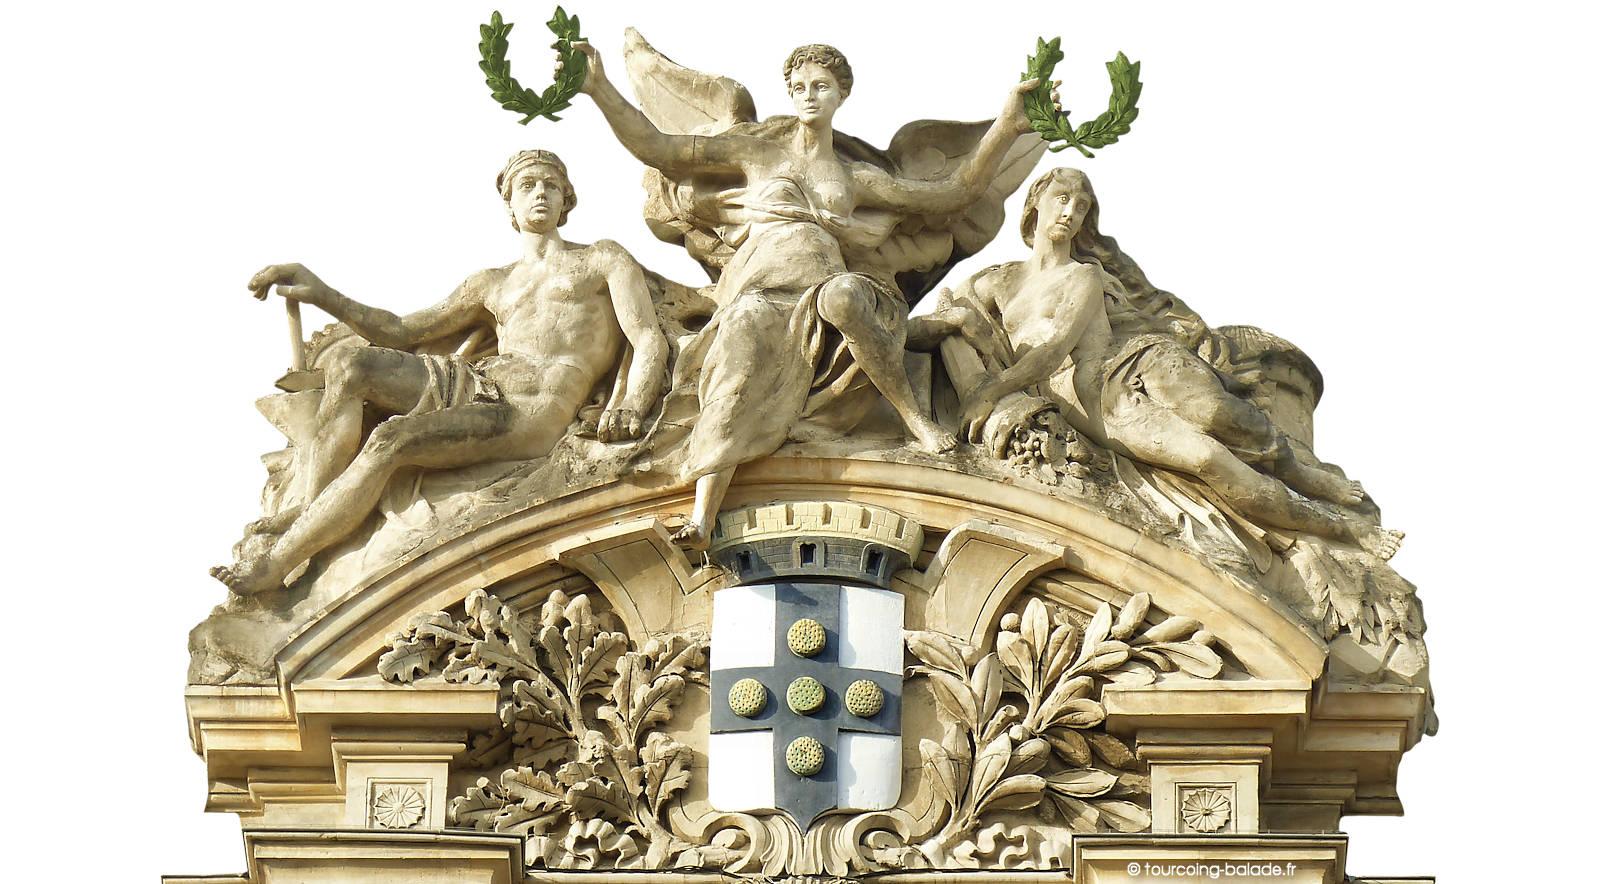 Marie de Tourcoing - Sculpture du Fronton